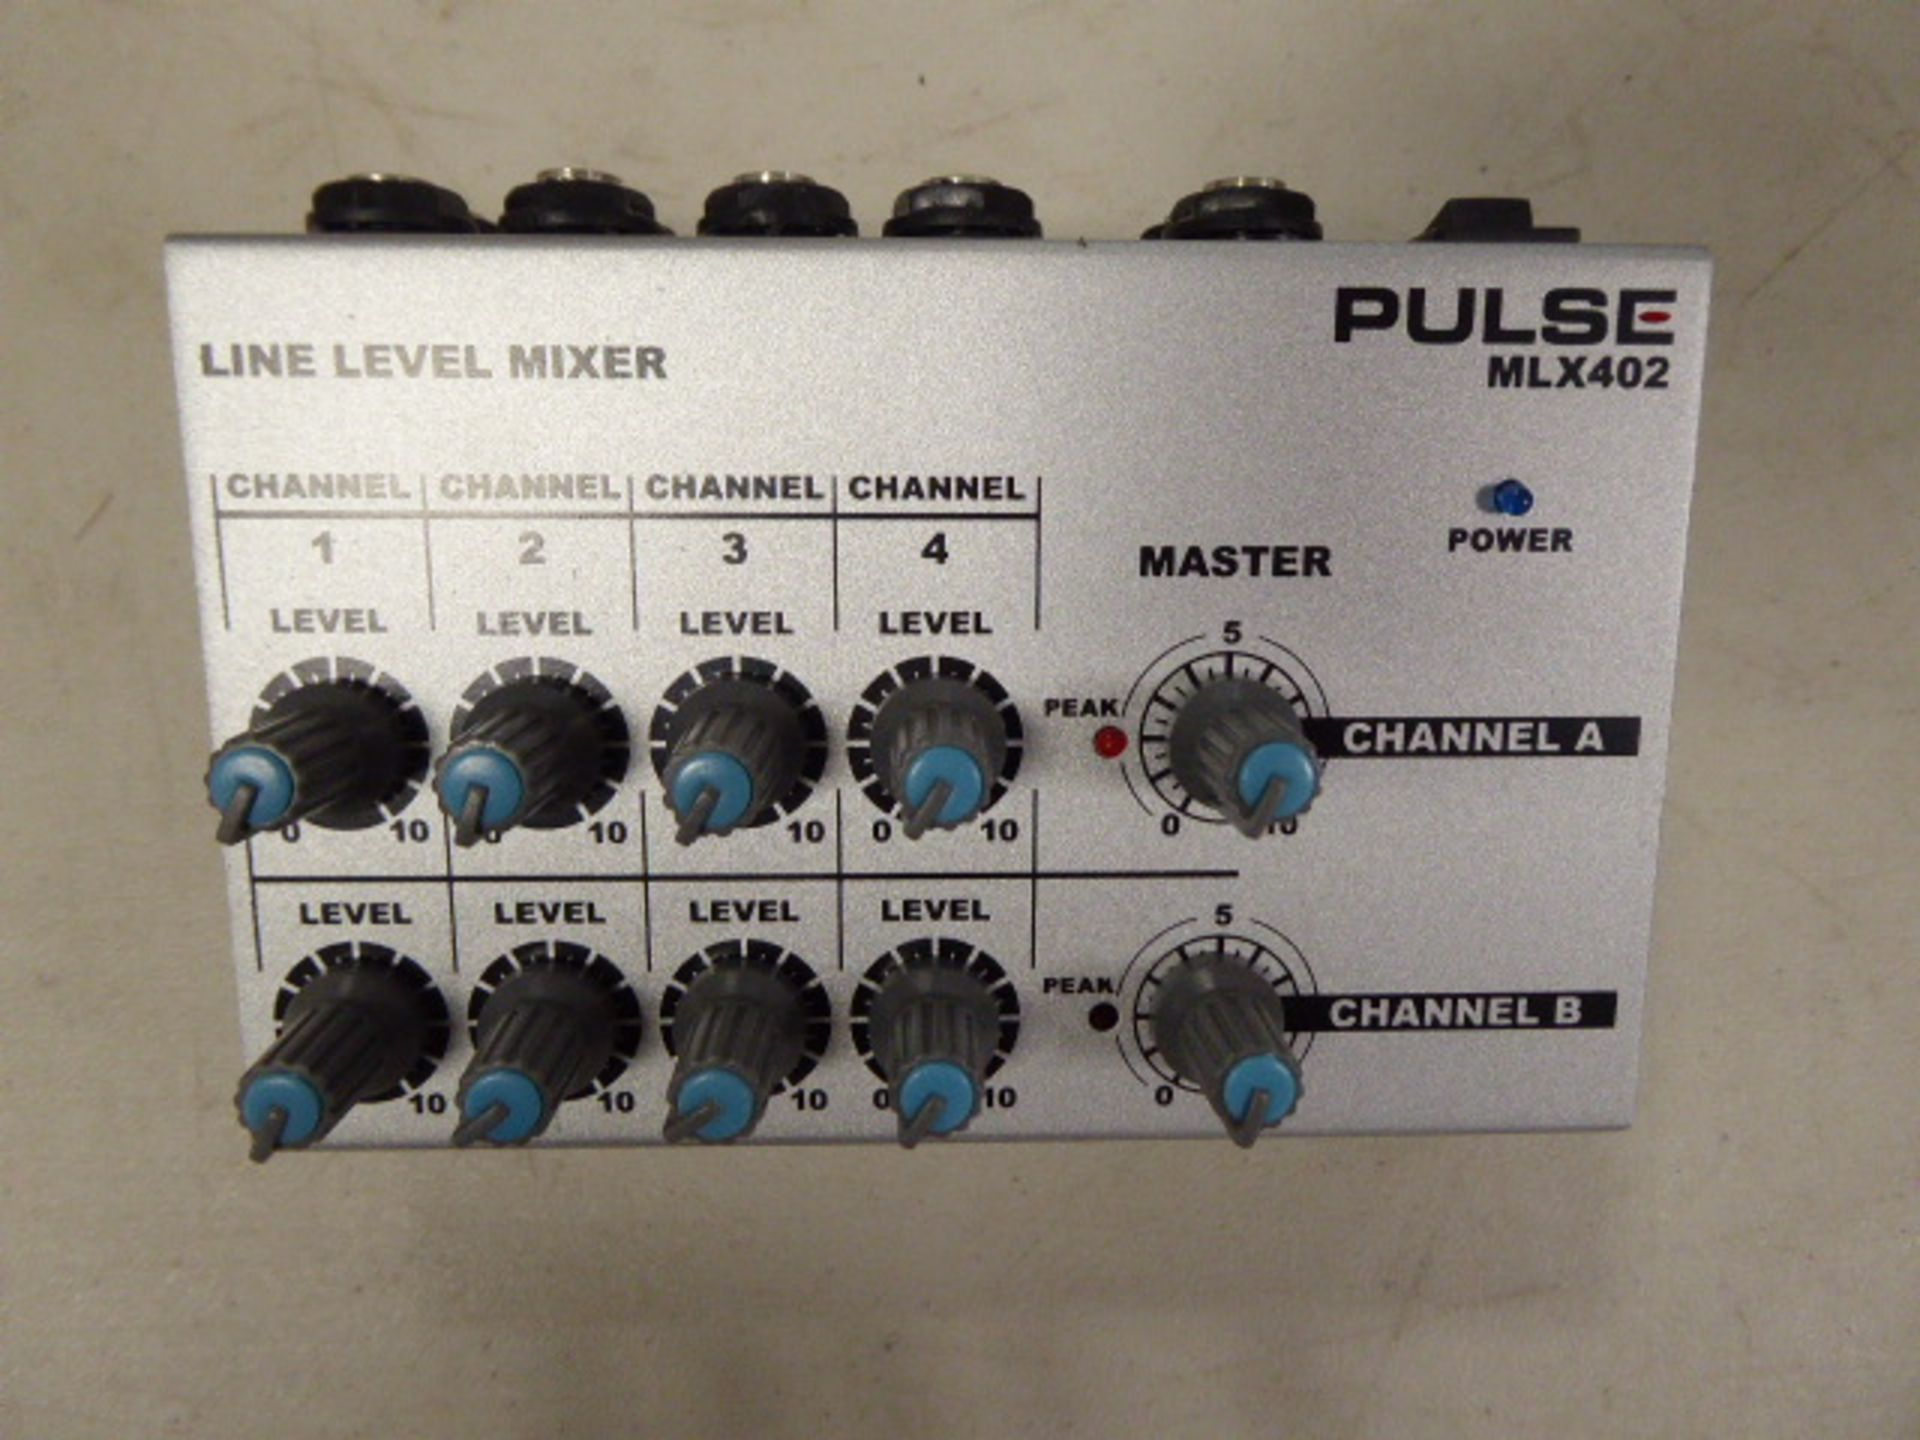 Pulse MLX402 Line level mixer